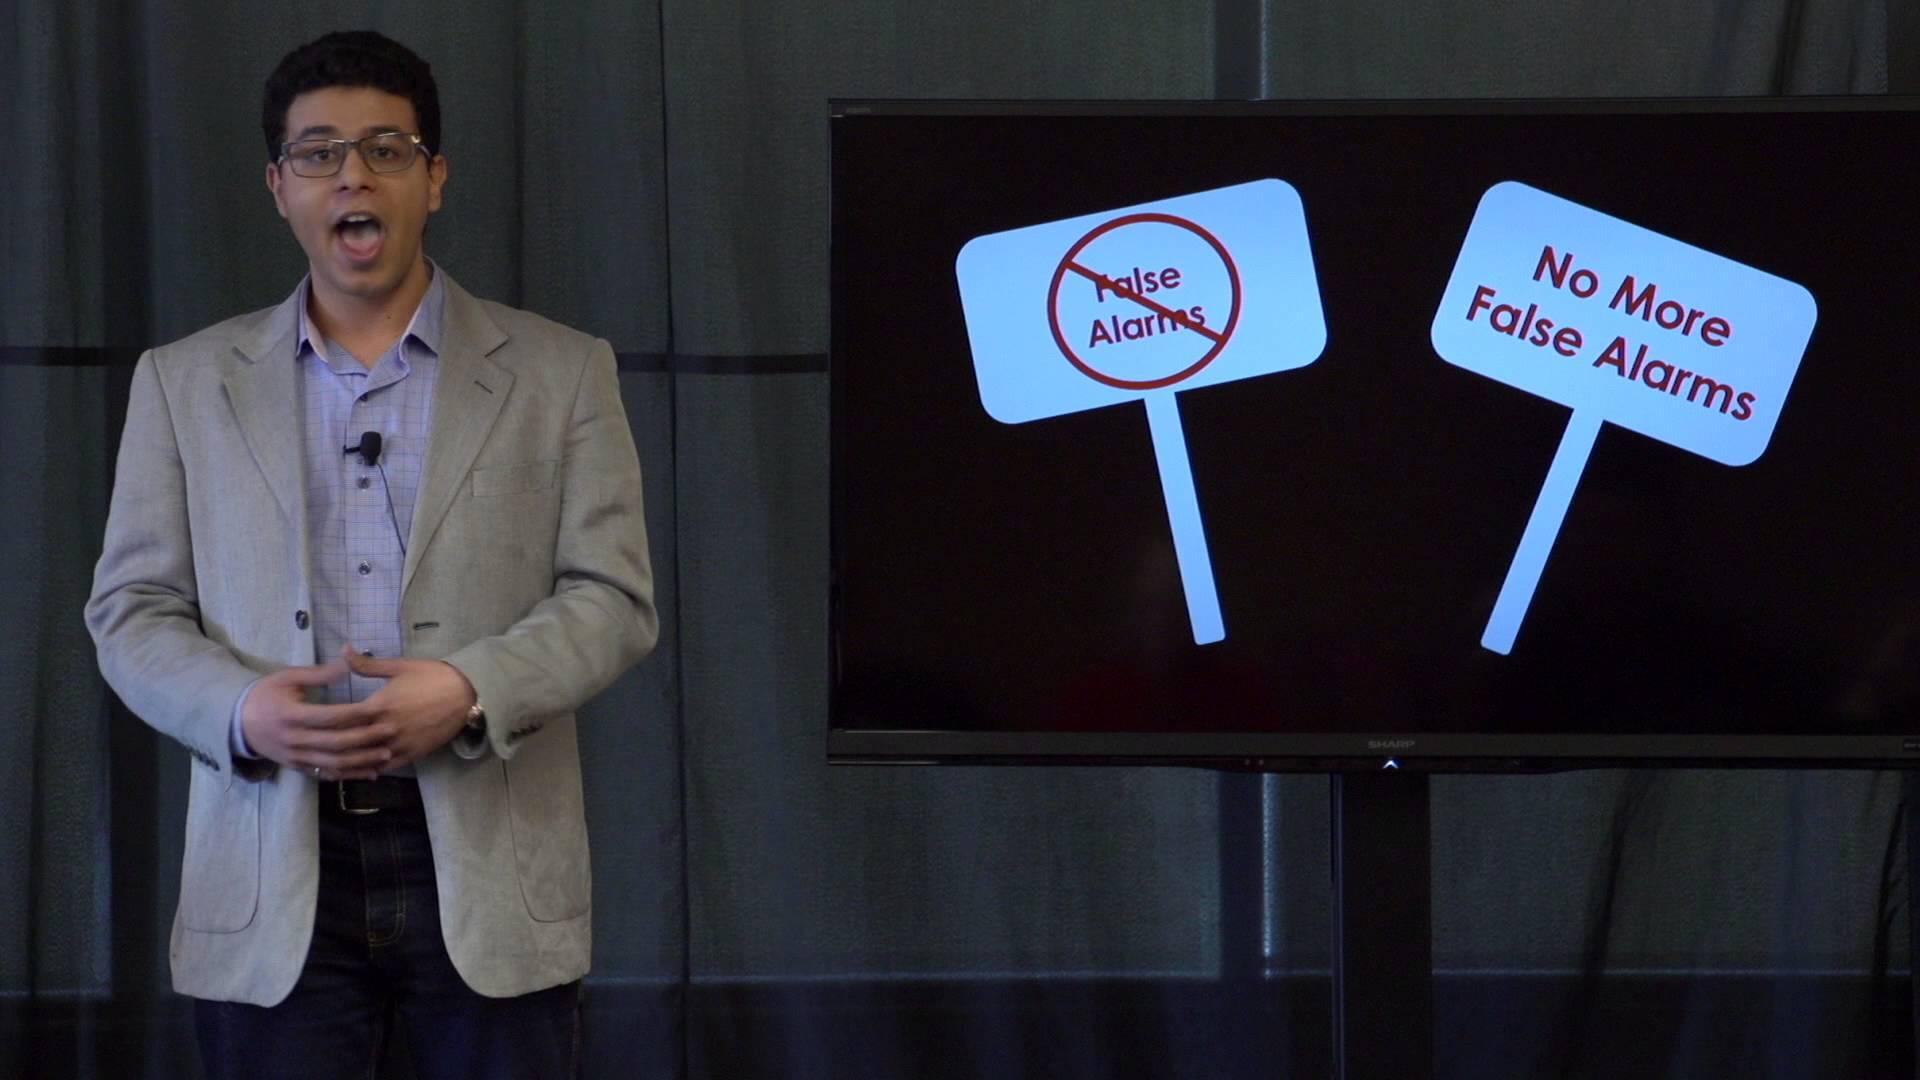 3MT Participant Mohamed Abdelazez on false alarms